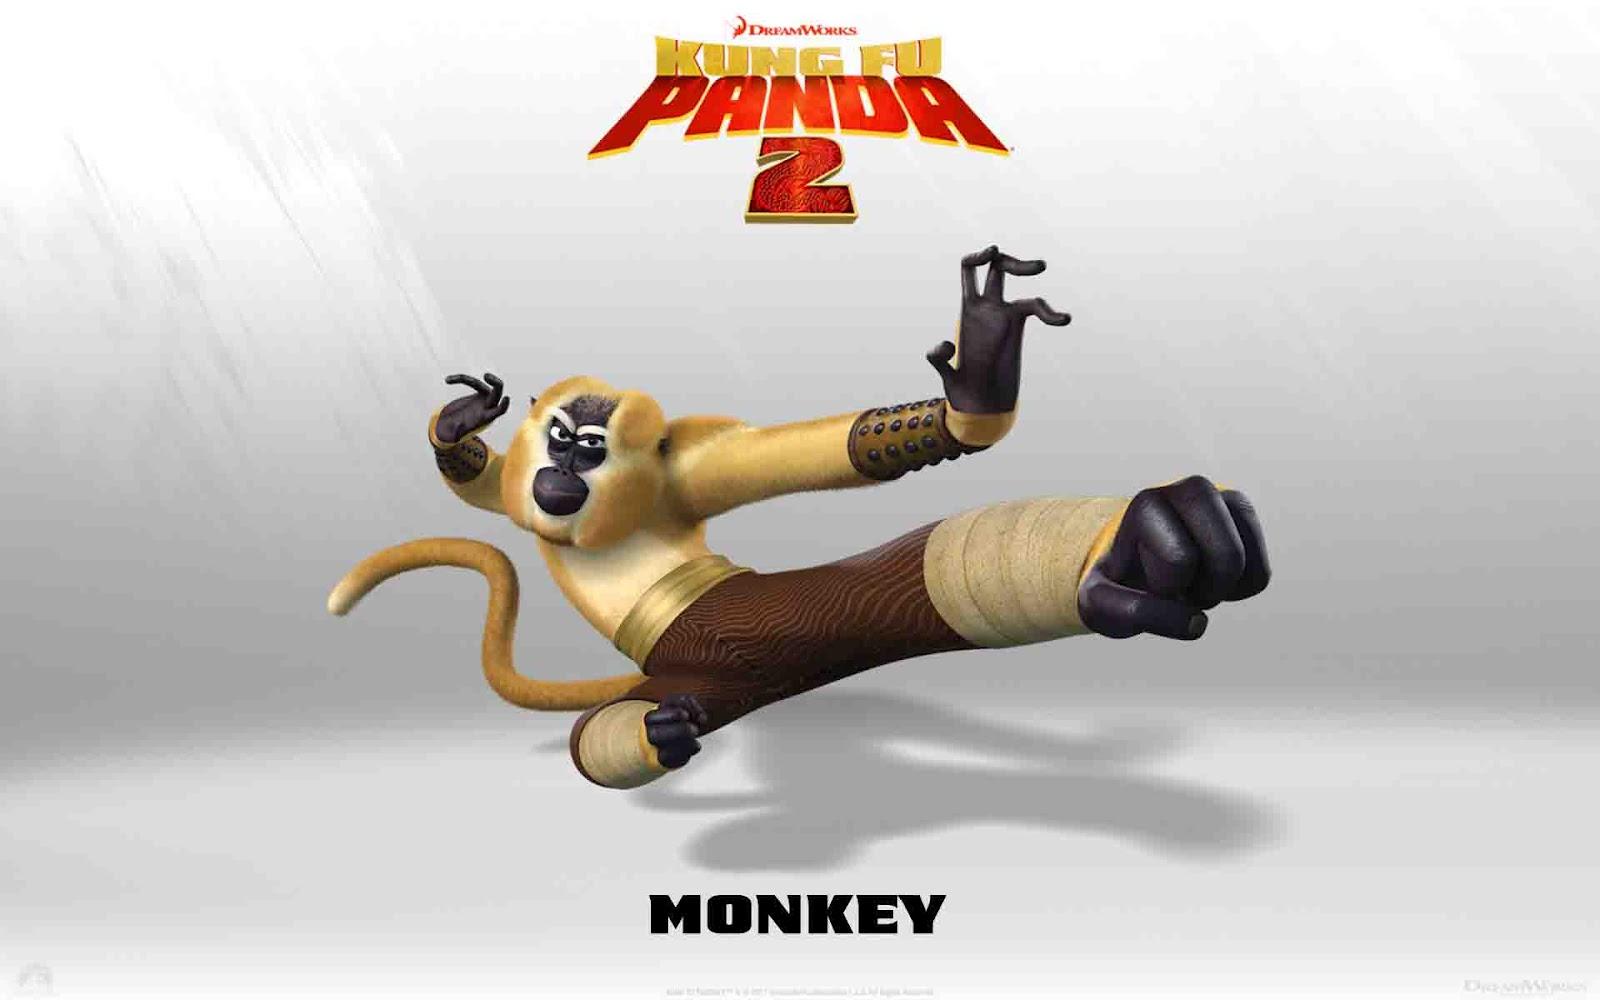 http://3.bp.blogspot.com/-2c1oYGKvoQ8/T02pTCZwb9I/AAAAAAAAAh0/GPUGtdqVi1U/s1600/kung-fu-panda-2-monkey.jpg